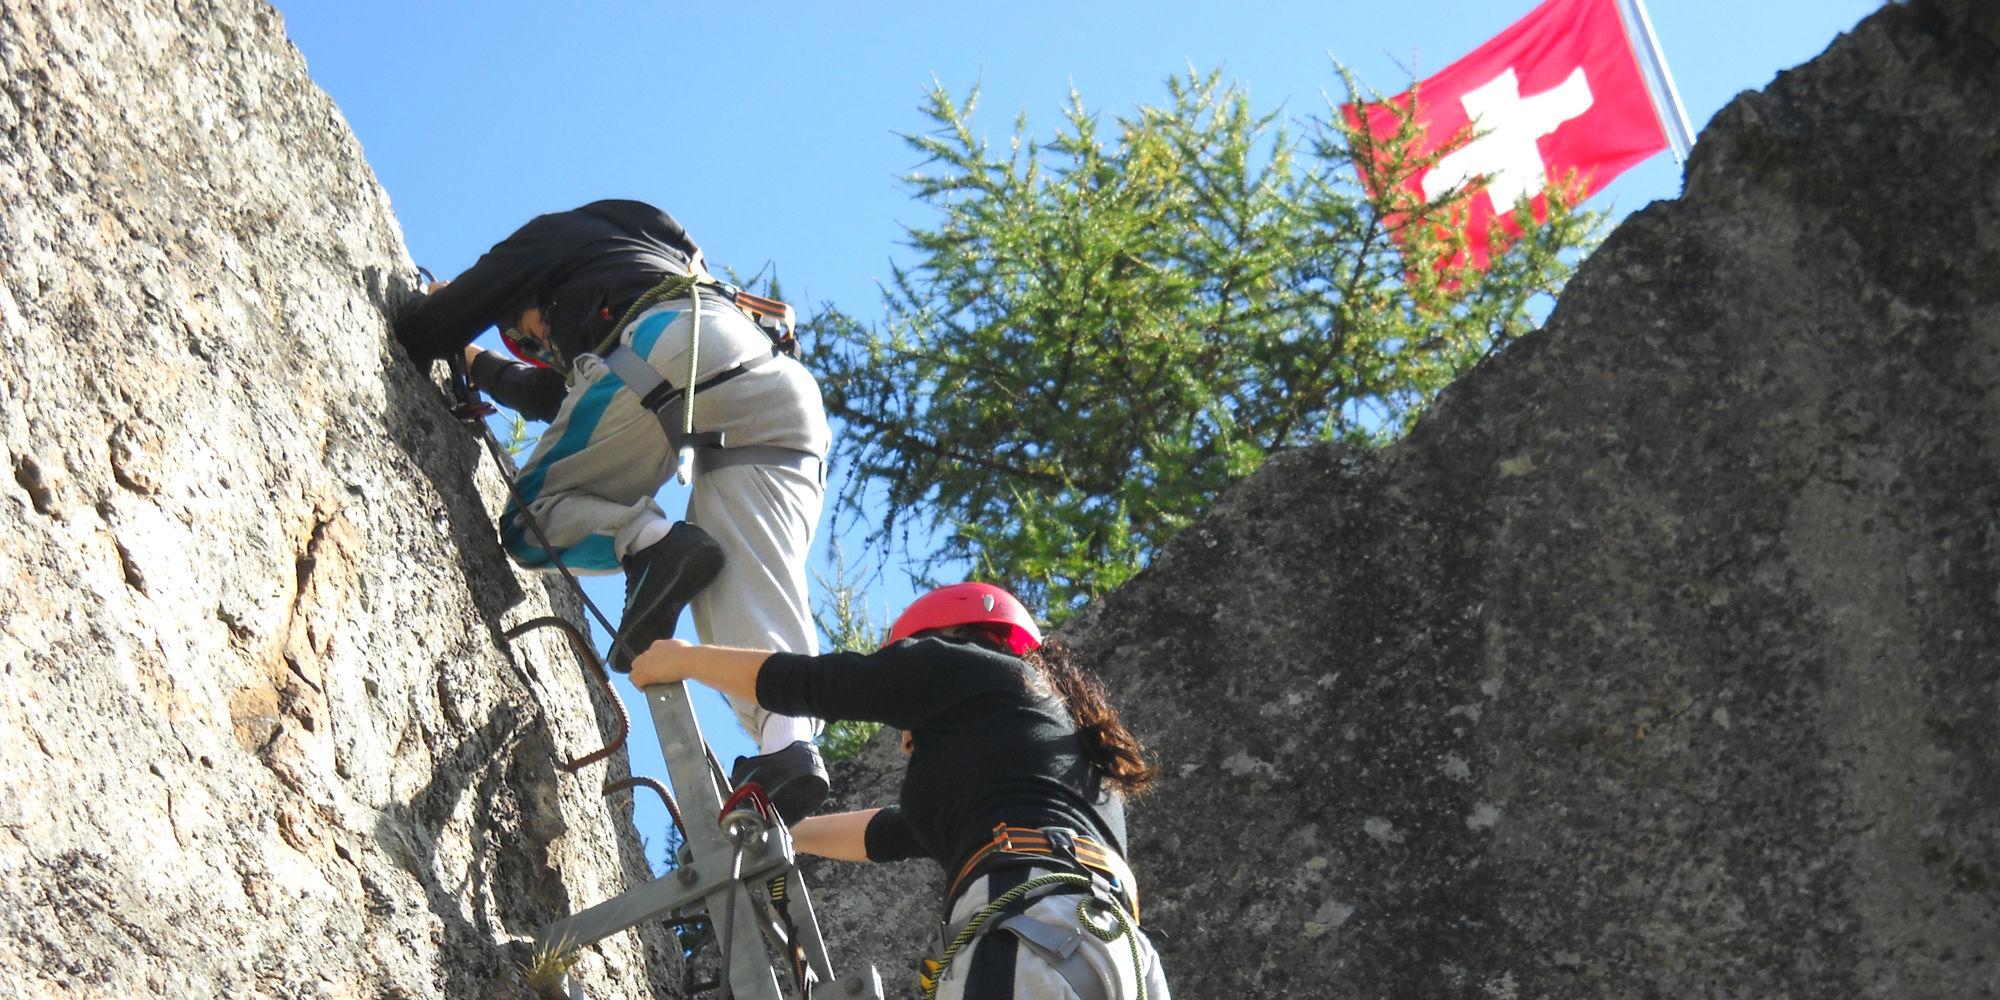 Jardin d'escalade de Furggstalden dans la République Libre des Vacances Saas-Fee